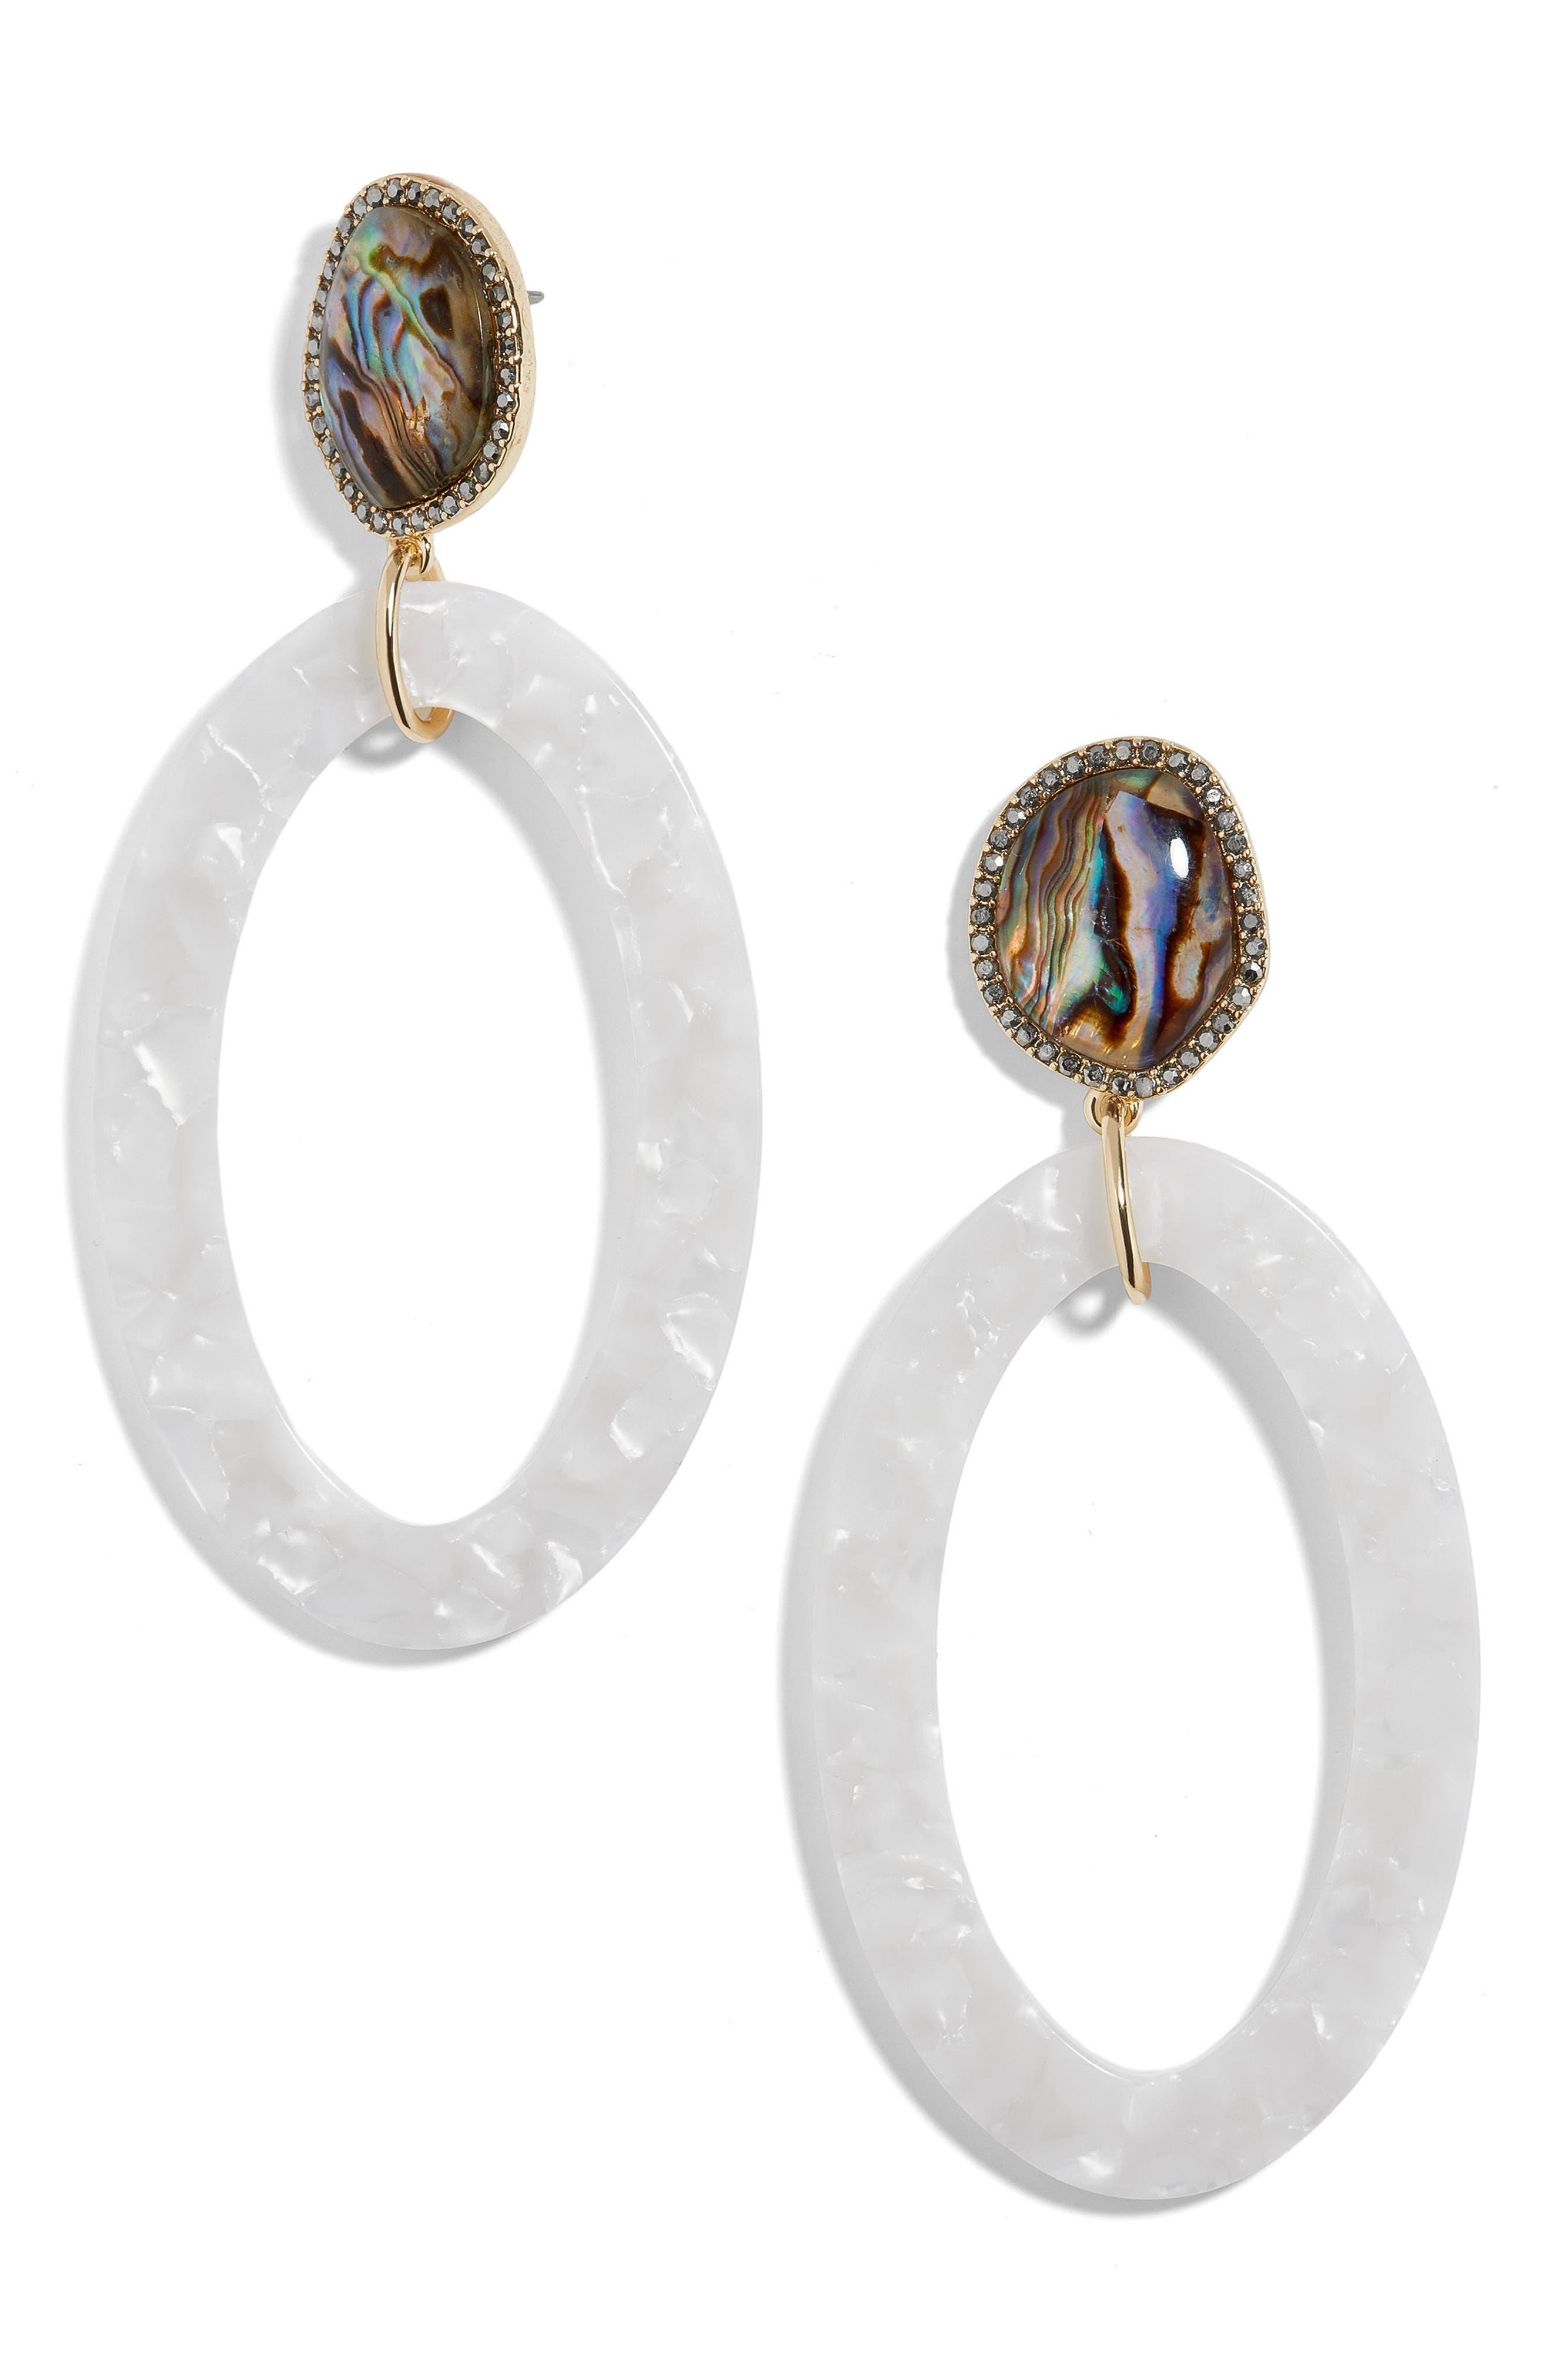 Trisha Drusy & Oval Drop Earrings,                             Main thumbnail 1, color,                             410